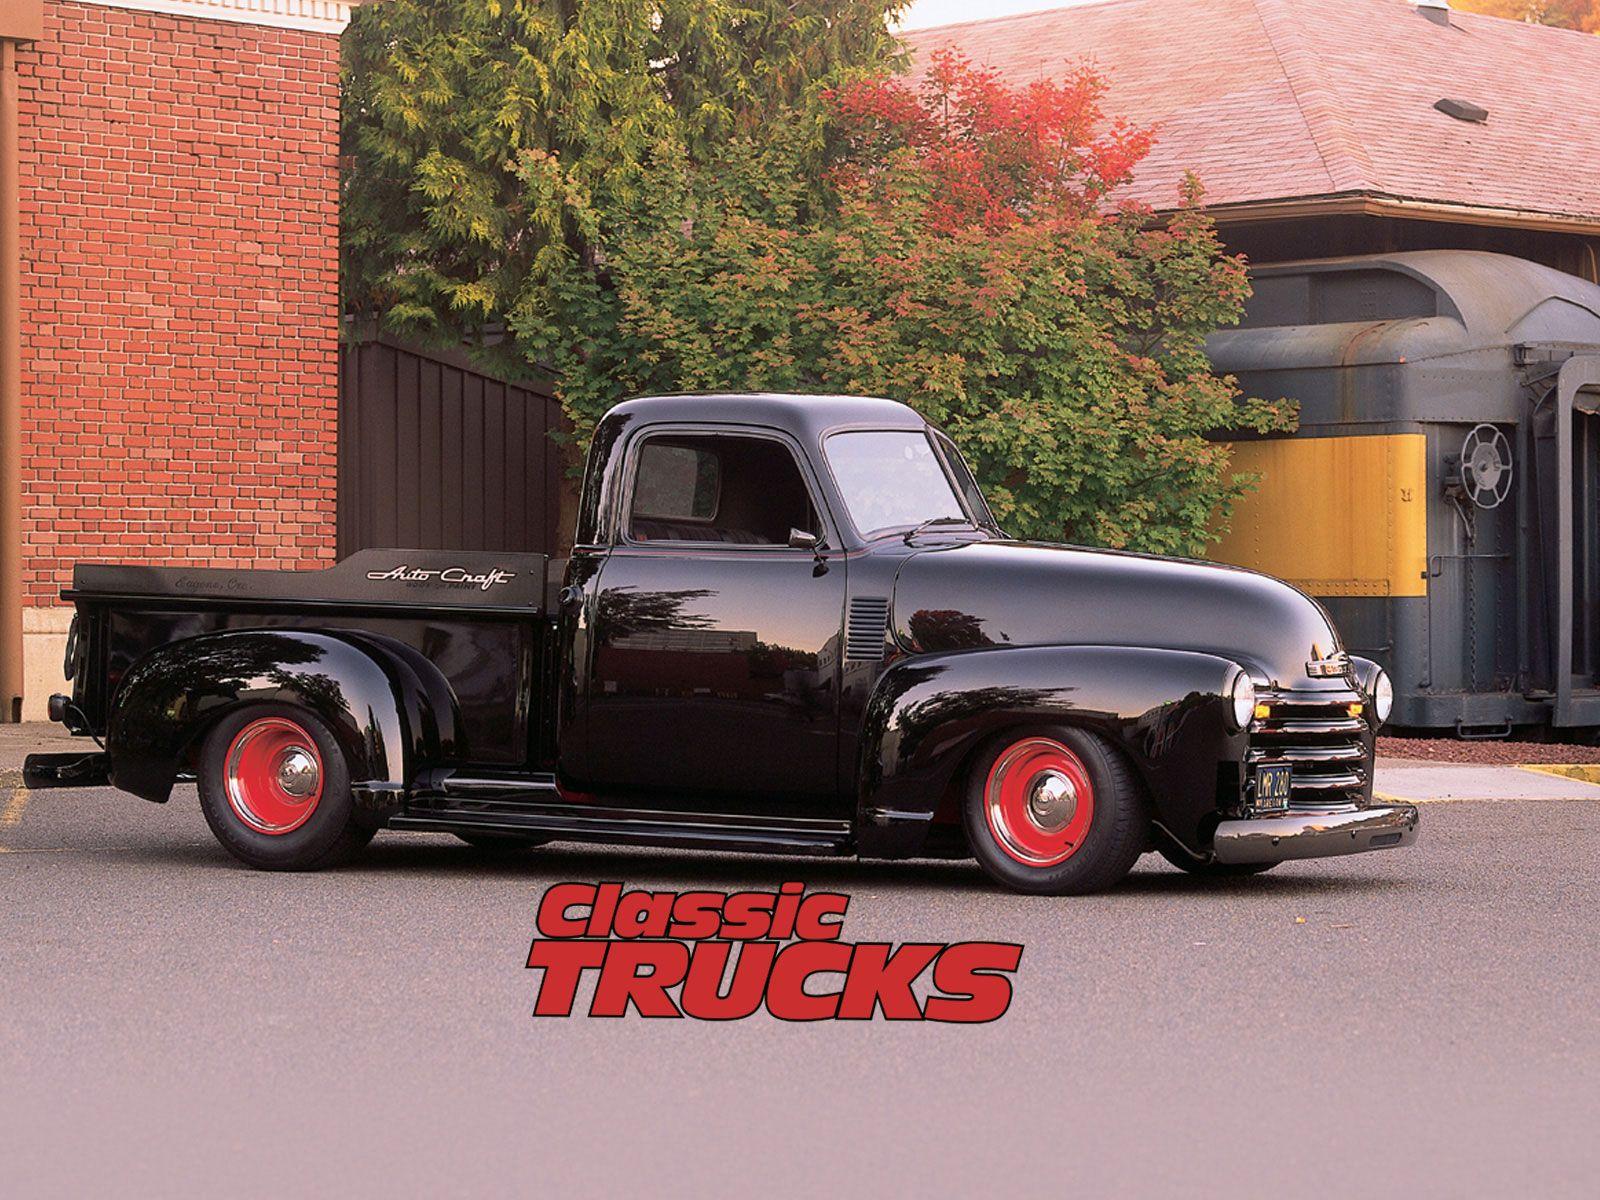 Classic Truck HD Desktop Background Wallpapers 9304 1600x1200